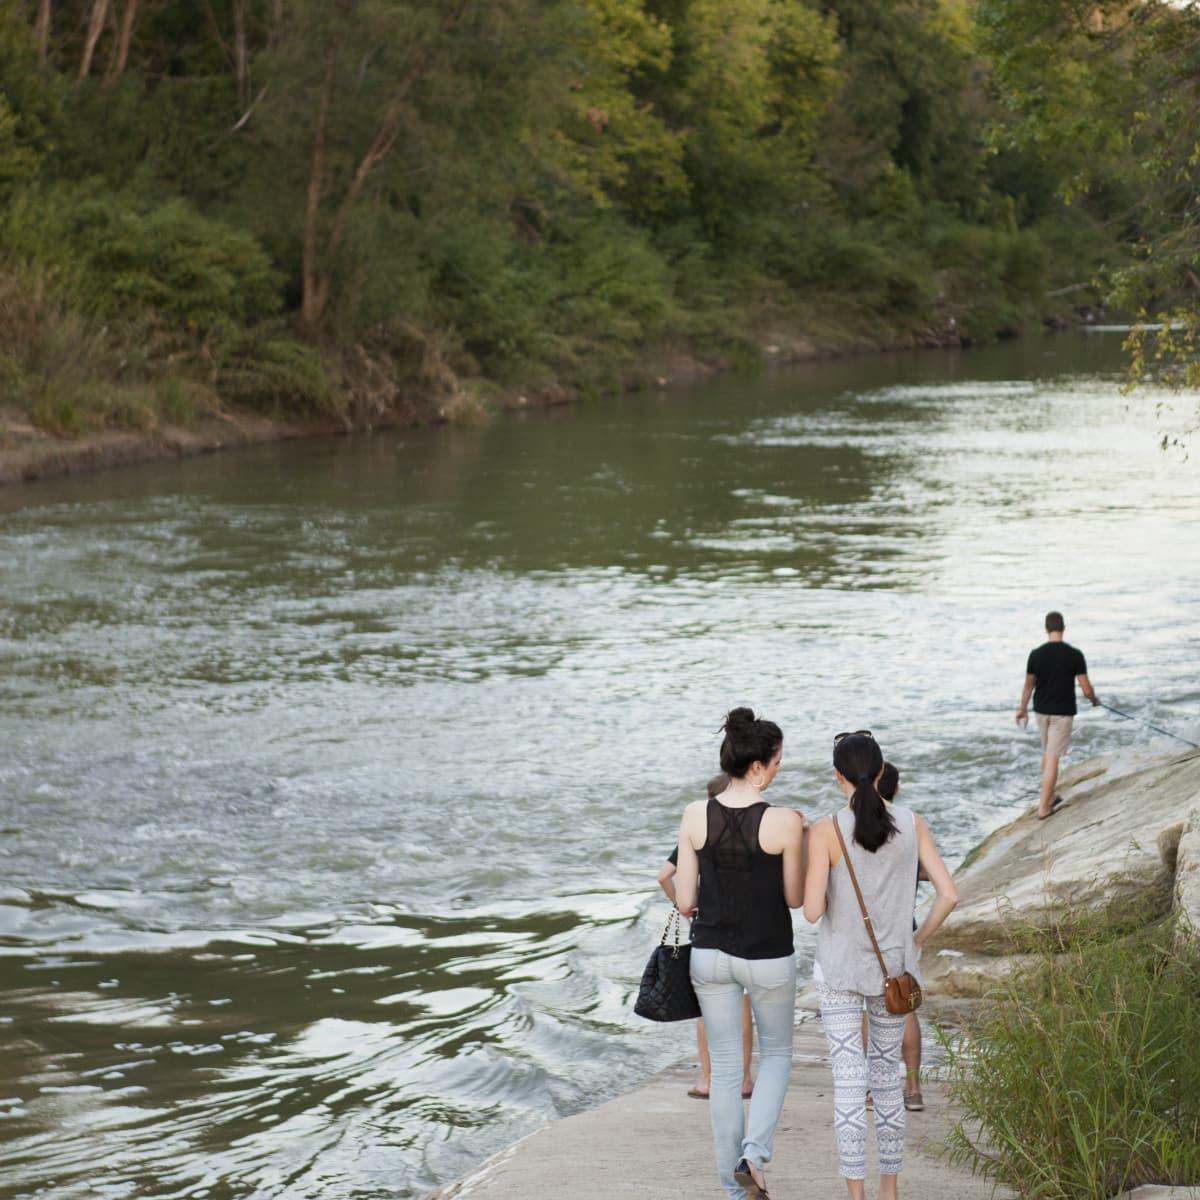 Trinity River Corridor Project